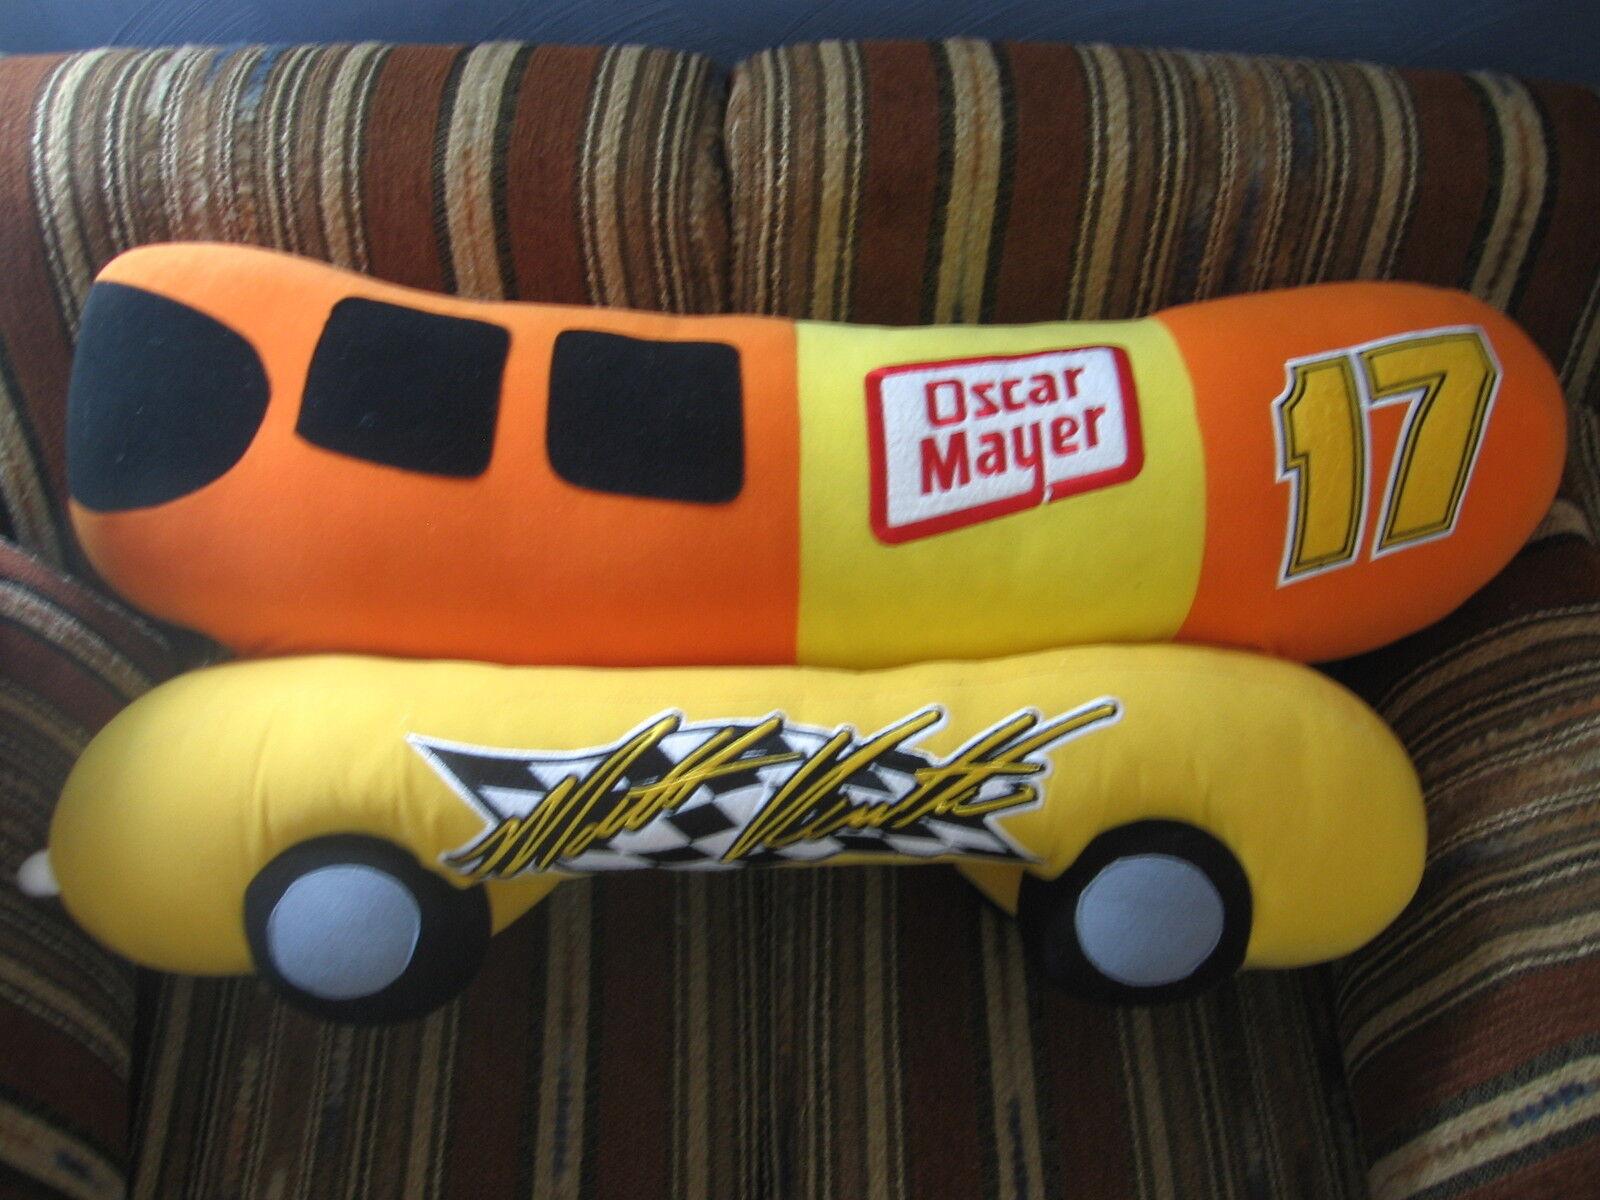 32  plush Jumbo Wiener Mobile  17 Matt Kenseth, from Nascar, good condition RARE